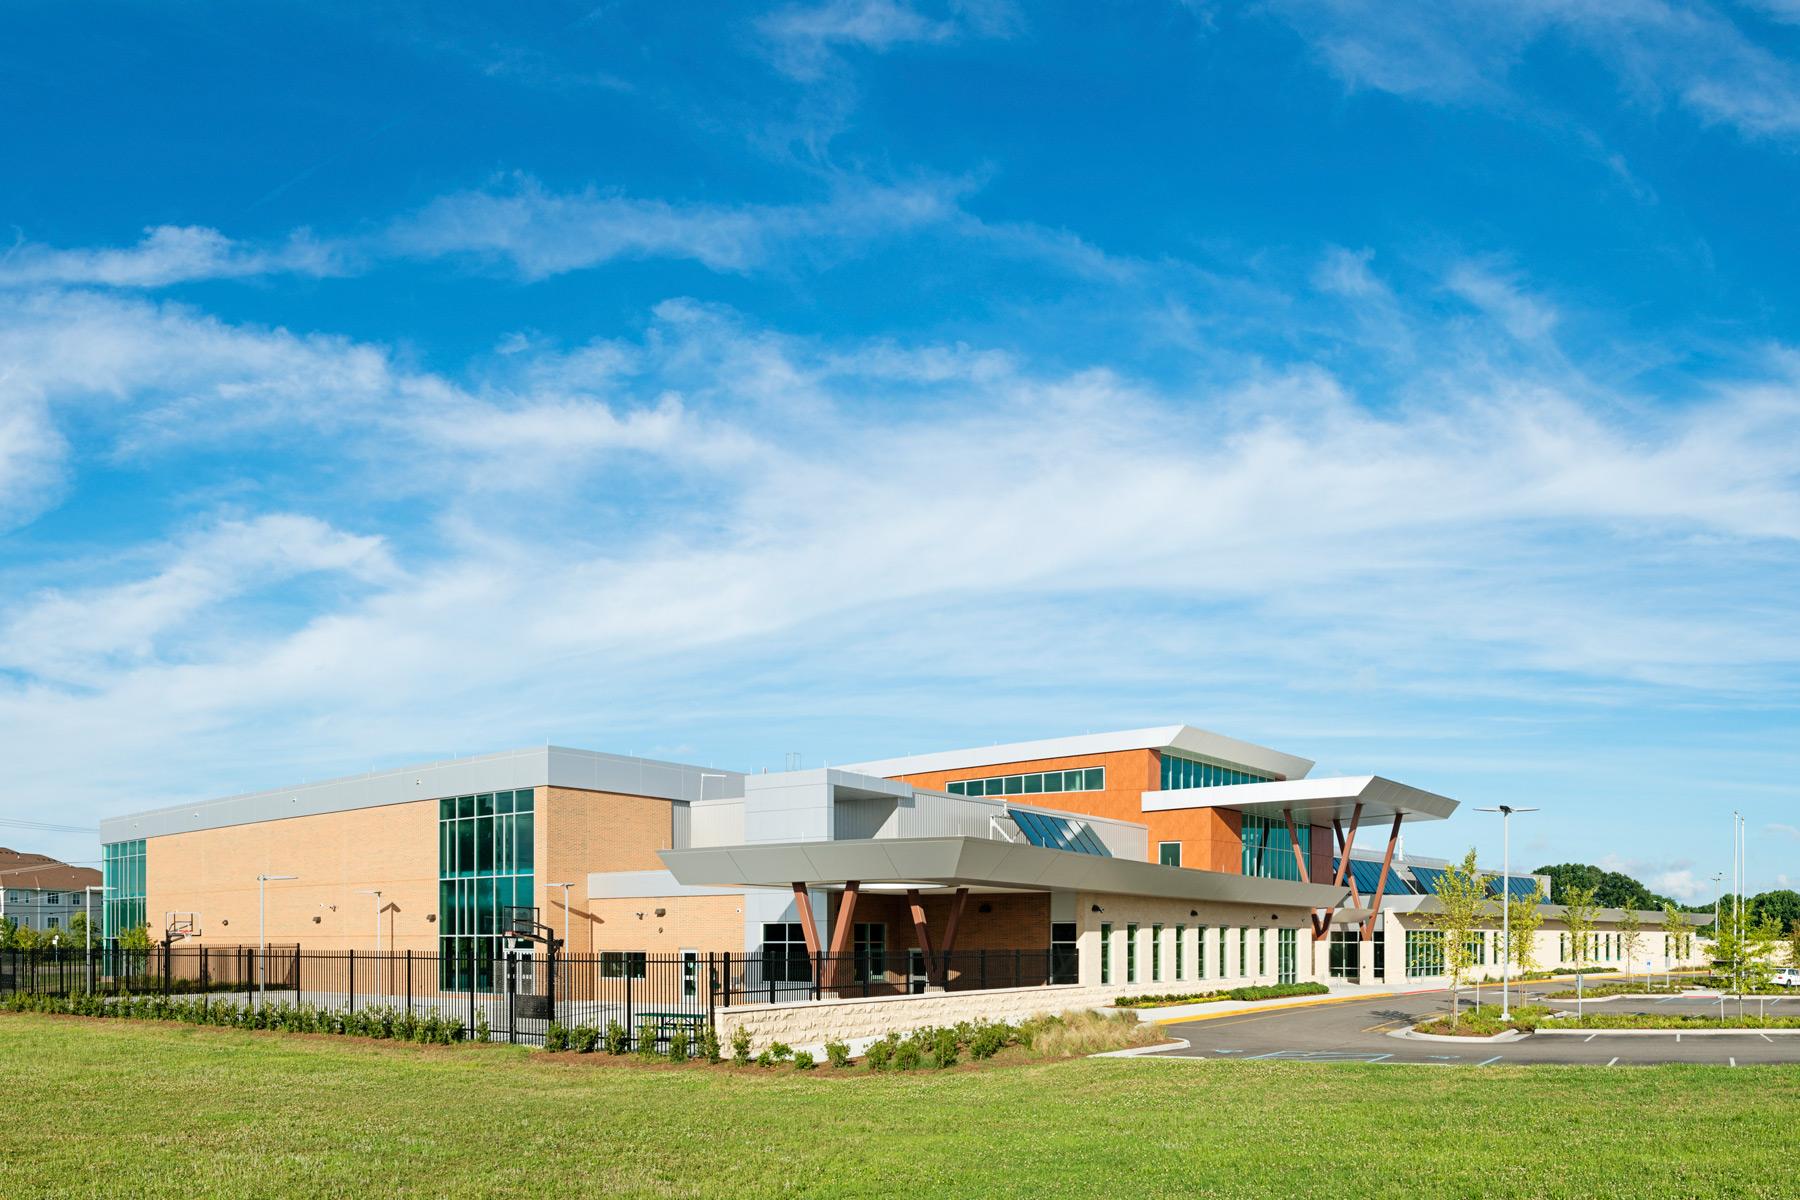 Community Centers